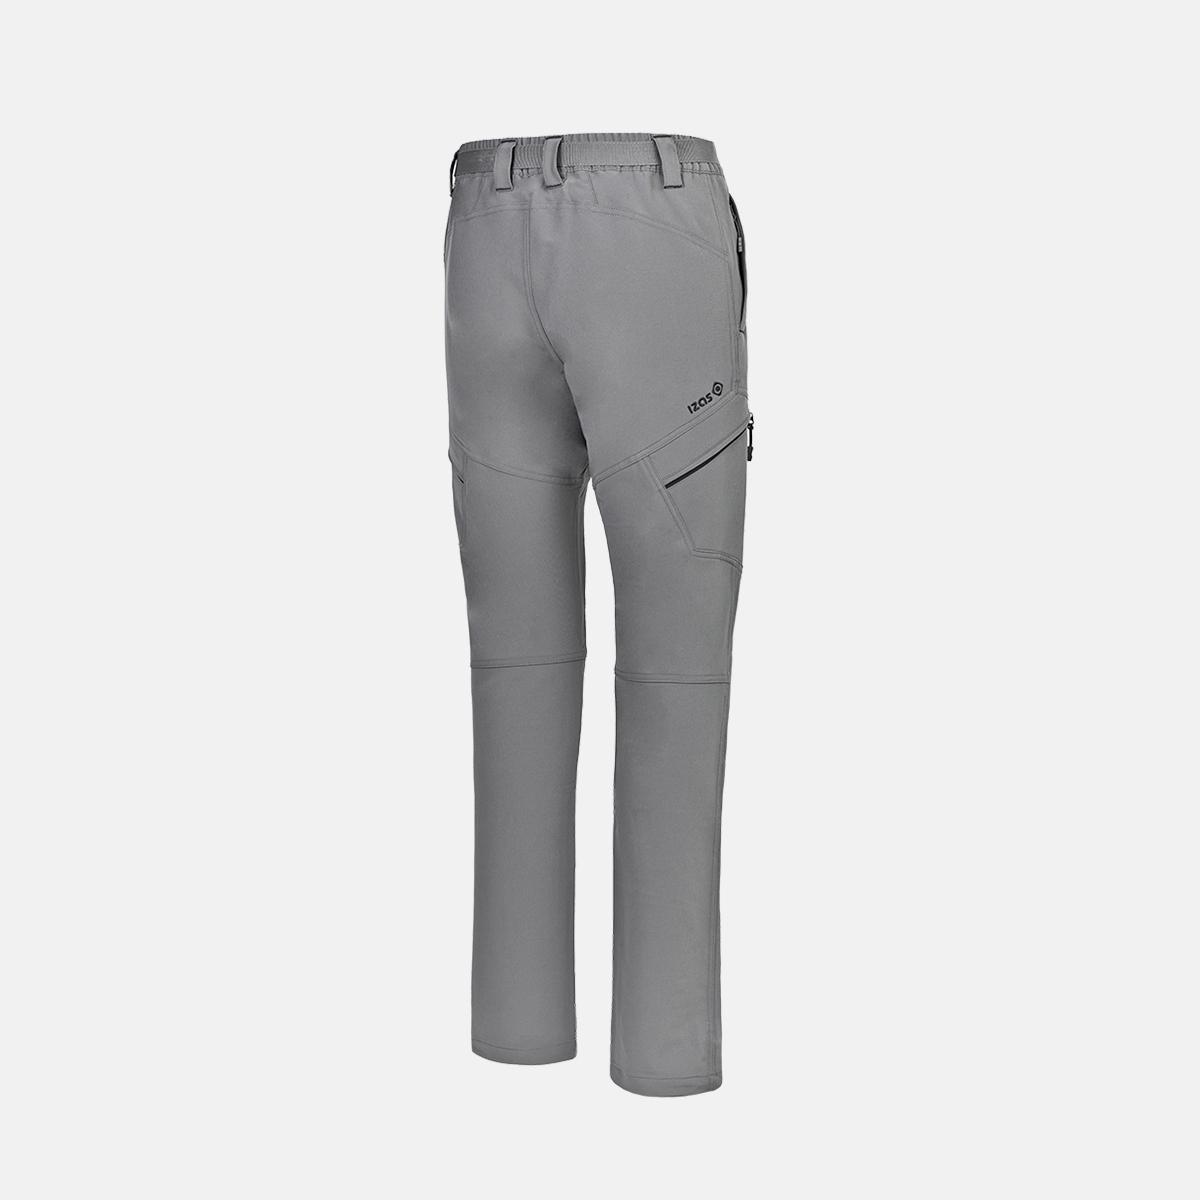 Pantalon De Montana Gris Hombre Invierno Baltic M Fw